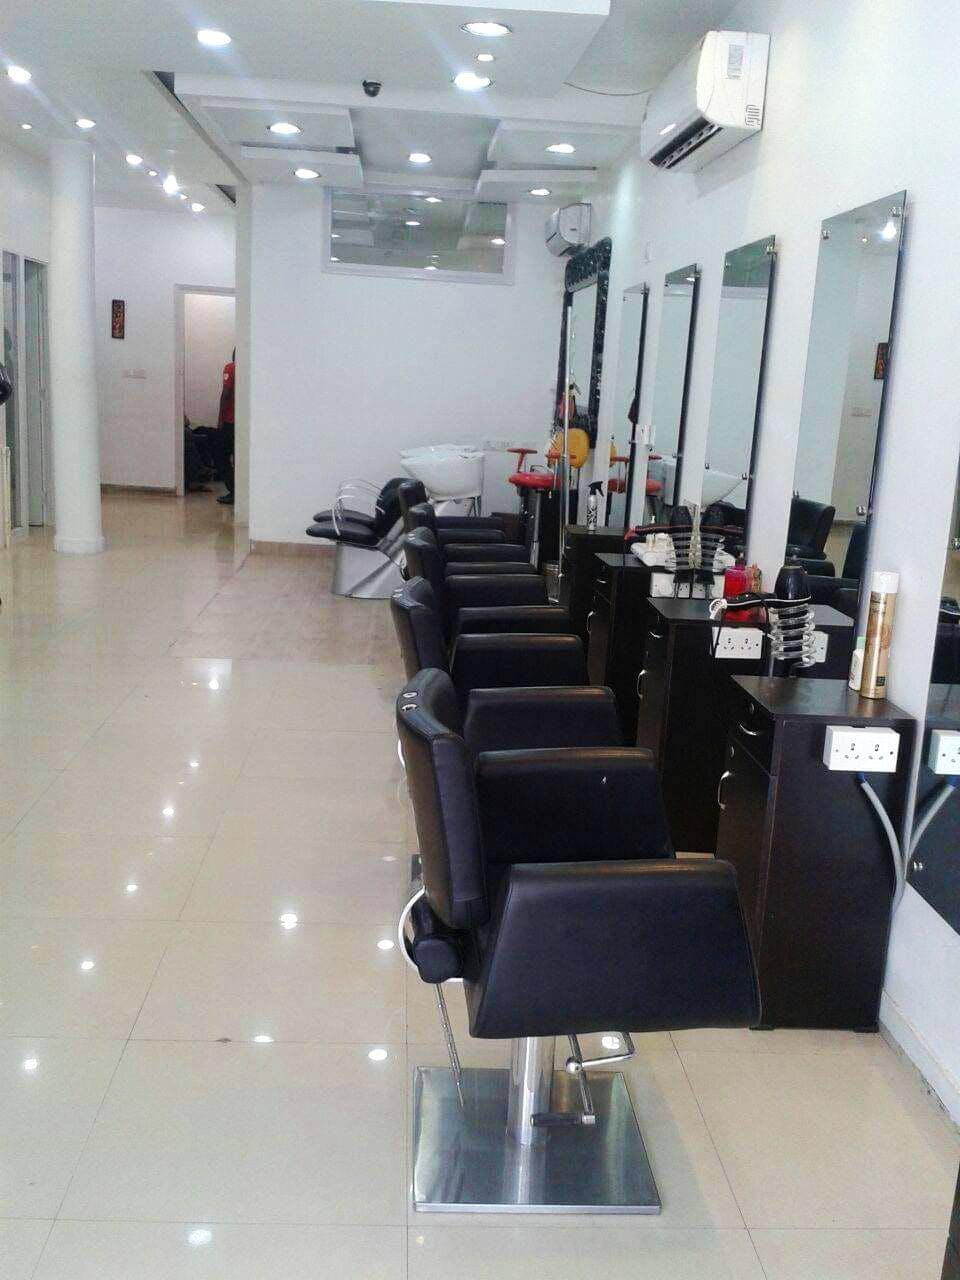 image - Dignity Salon